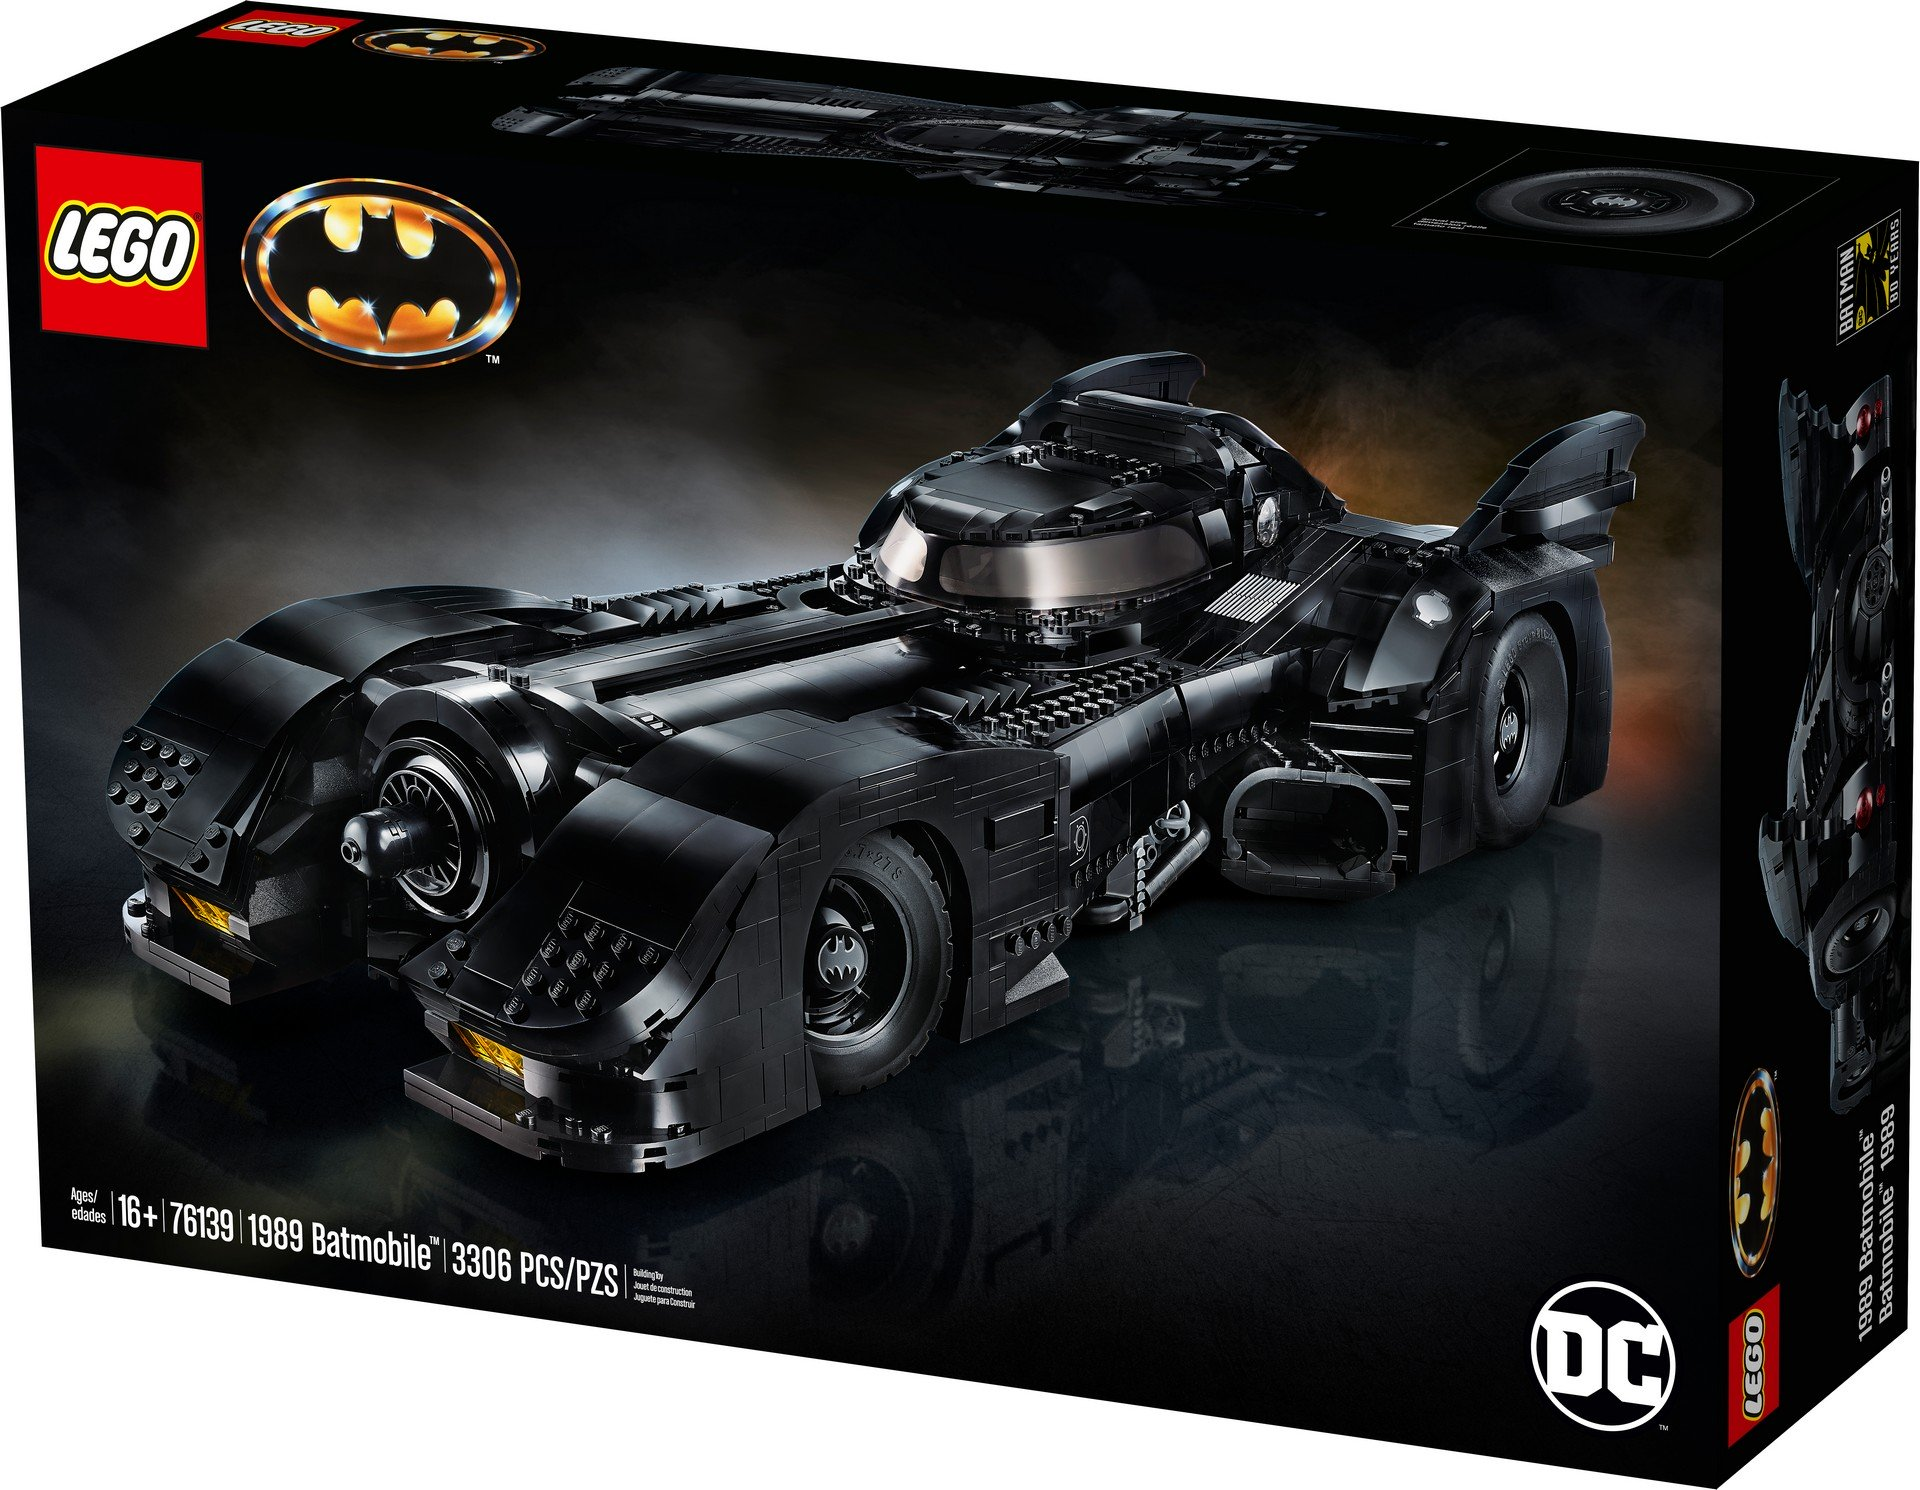 Lego-Batmobile-kit-1989-18